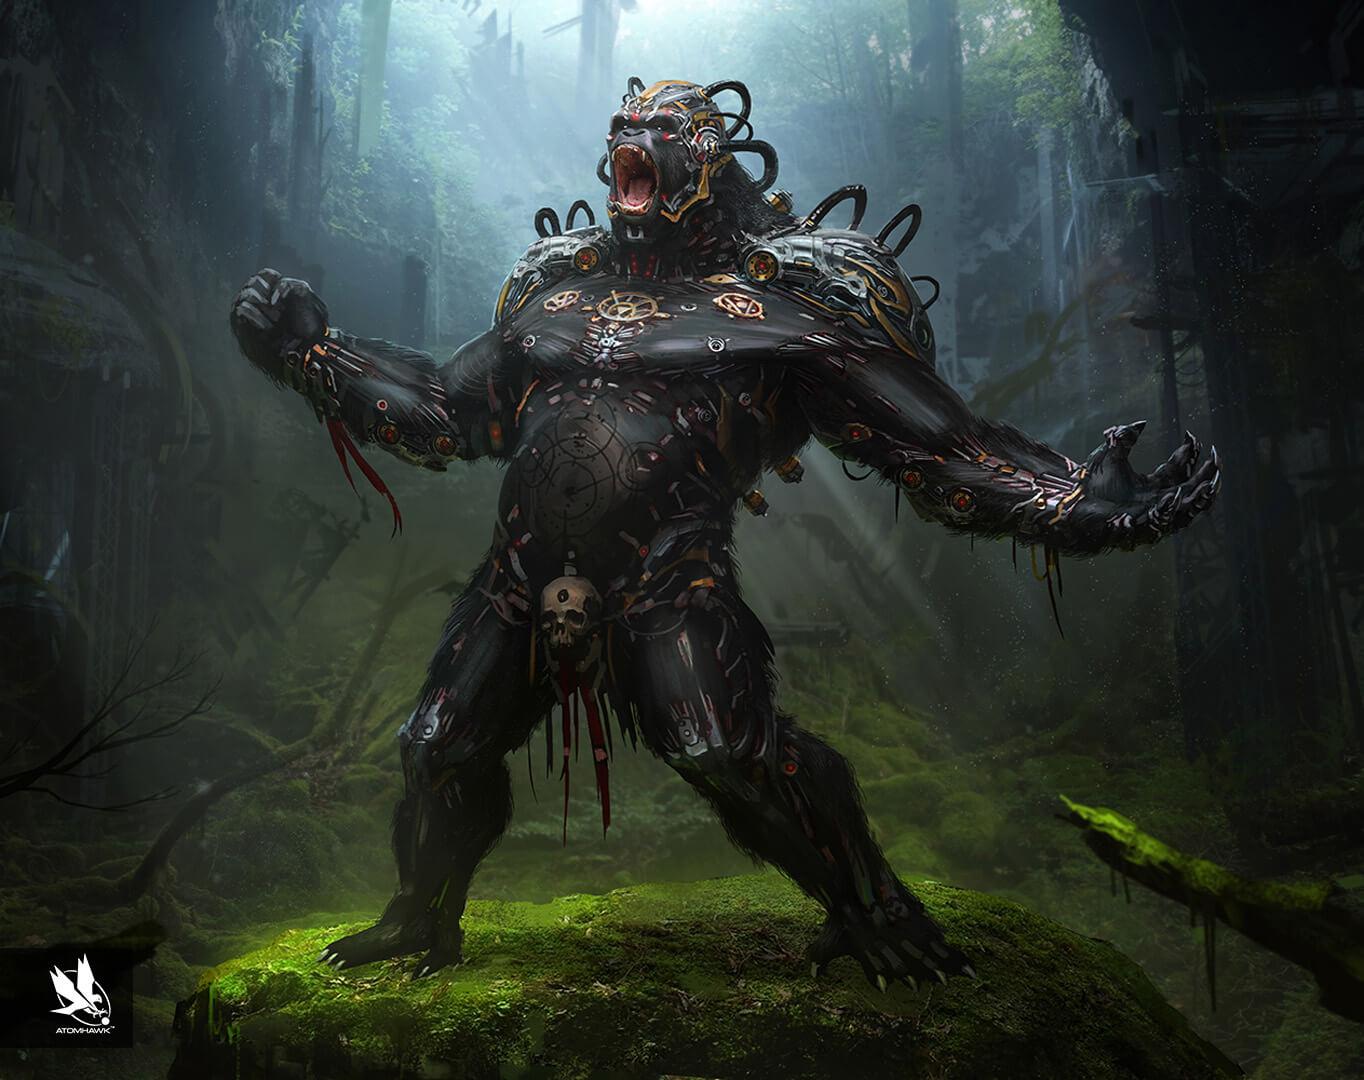 Atomhawk_Warner-Bros-NetherRealm_Injustice-2_Concept-Art_Character-Design_Gorilla-Grodd.jpg